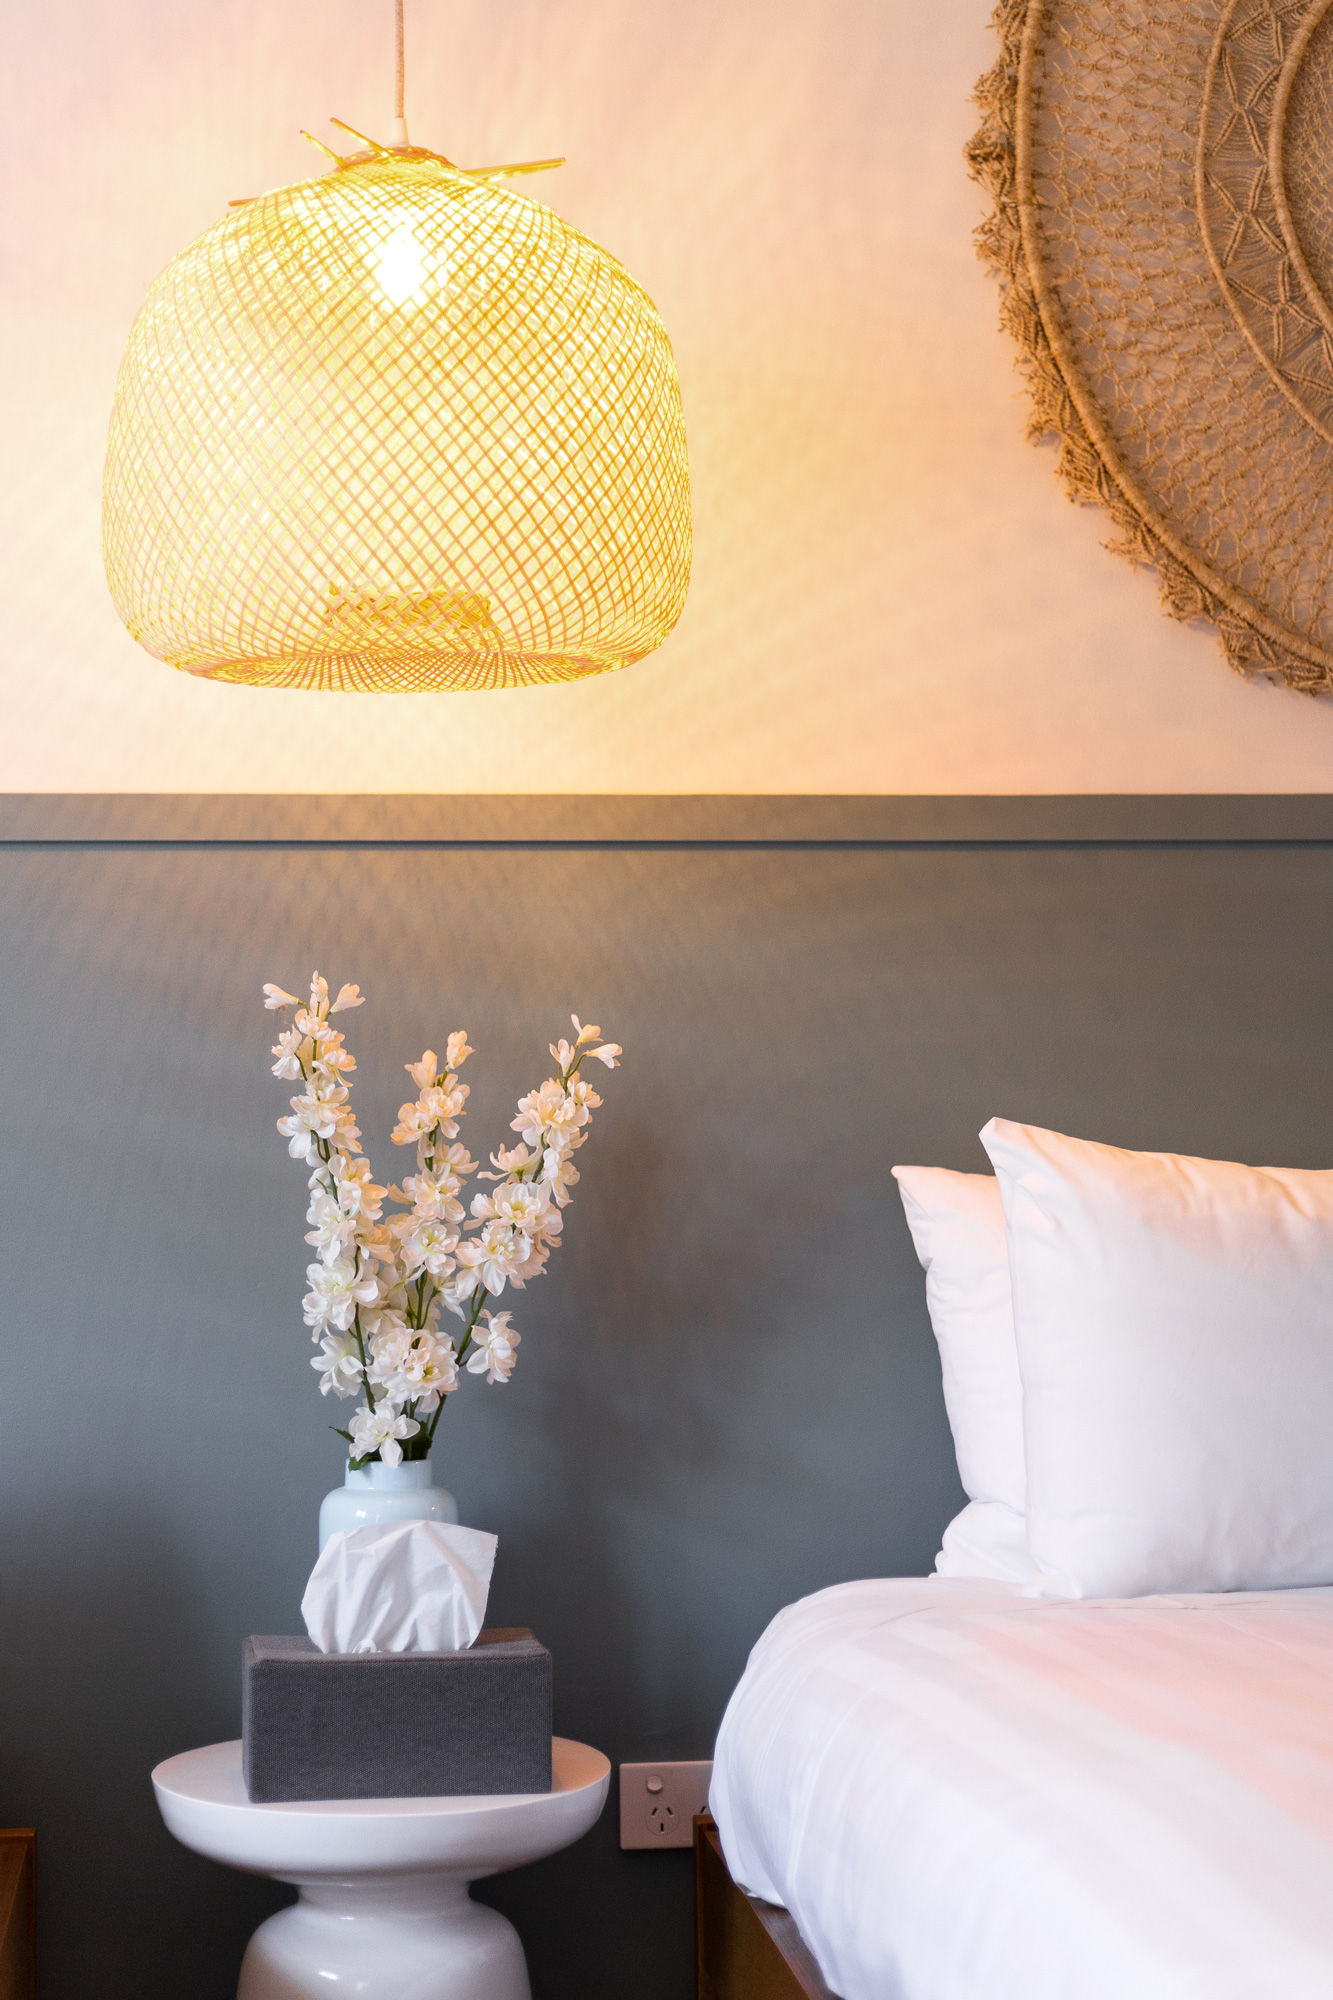 lorne_hotel_hotel_room_bedside_2.jpg